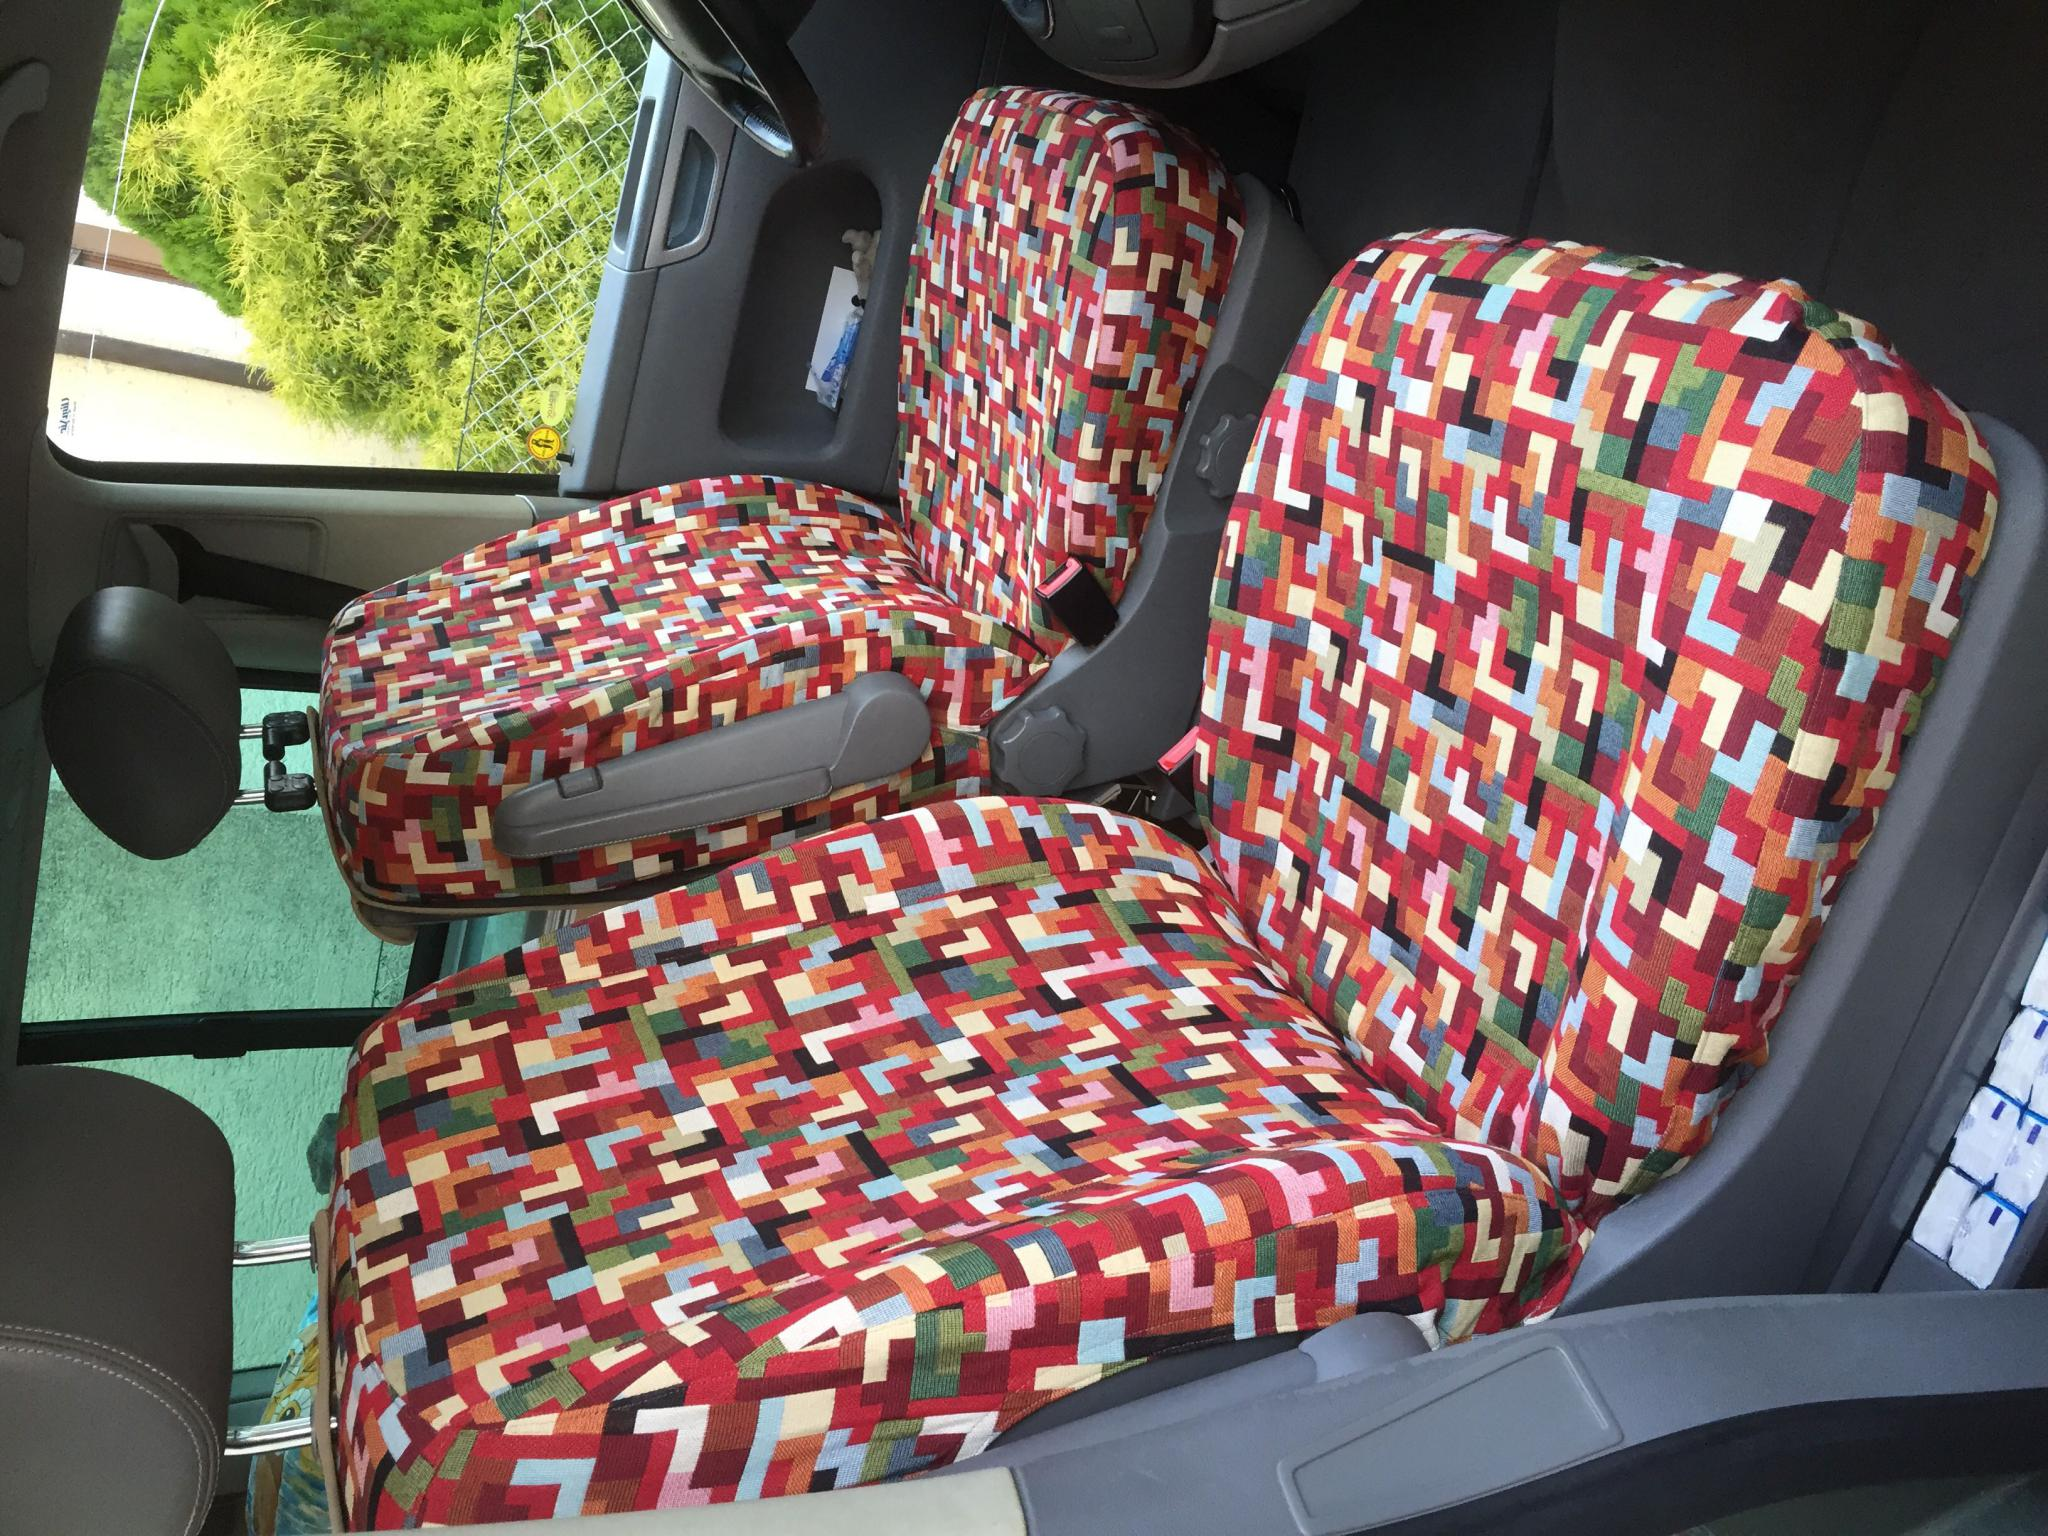 Sitzbezüge für Cali selbst genäht - VW California Zubehör ...